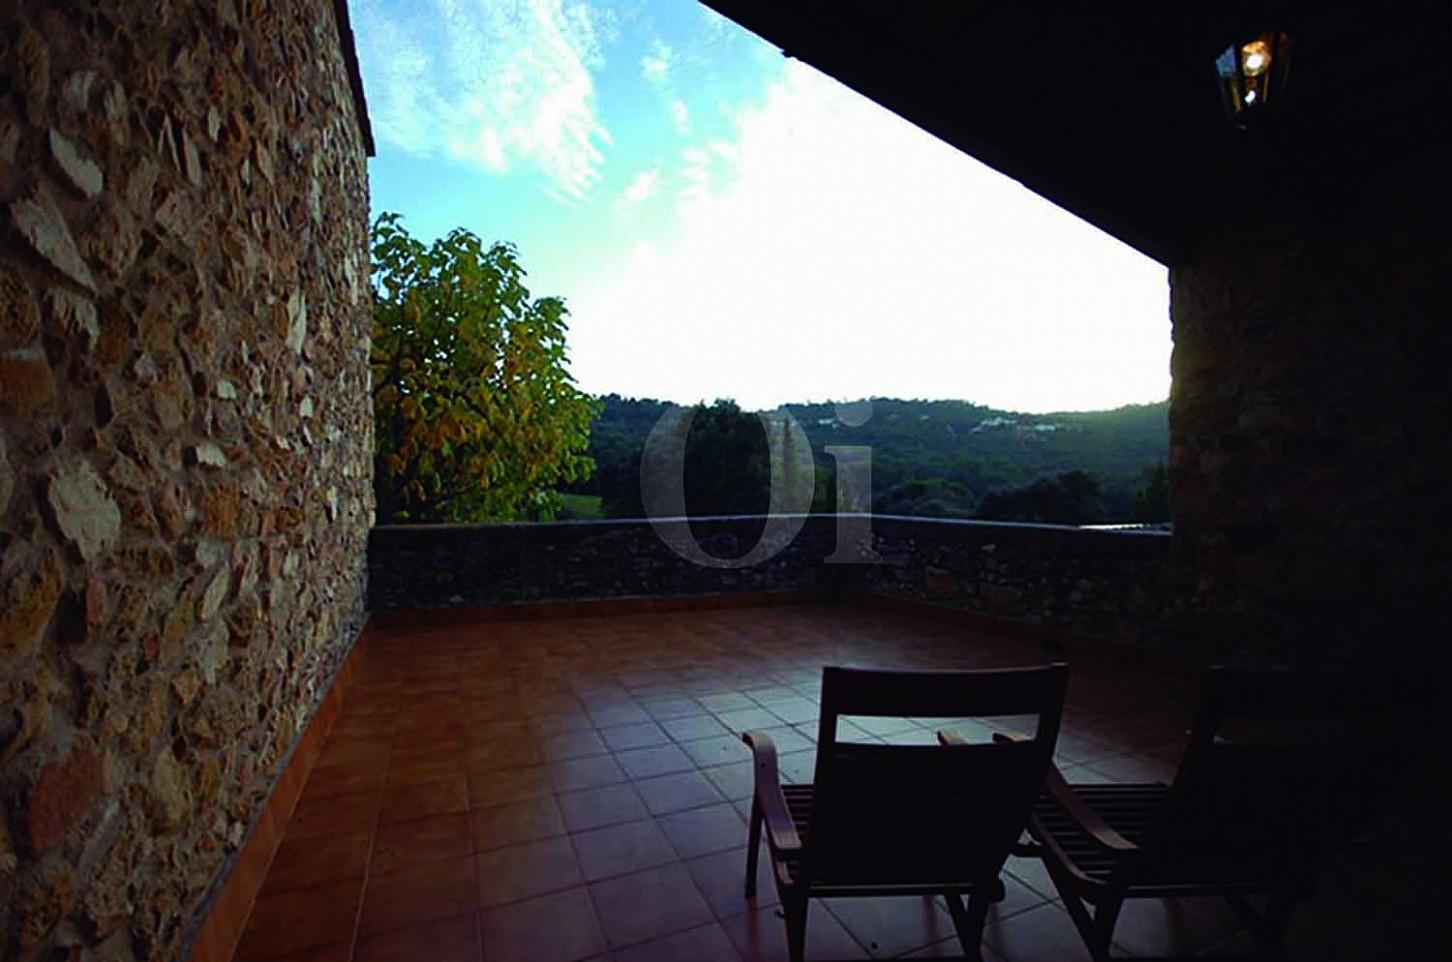 Terrasse de la maison en vente à Calonge, Costa Brava, Gerona